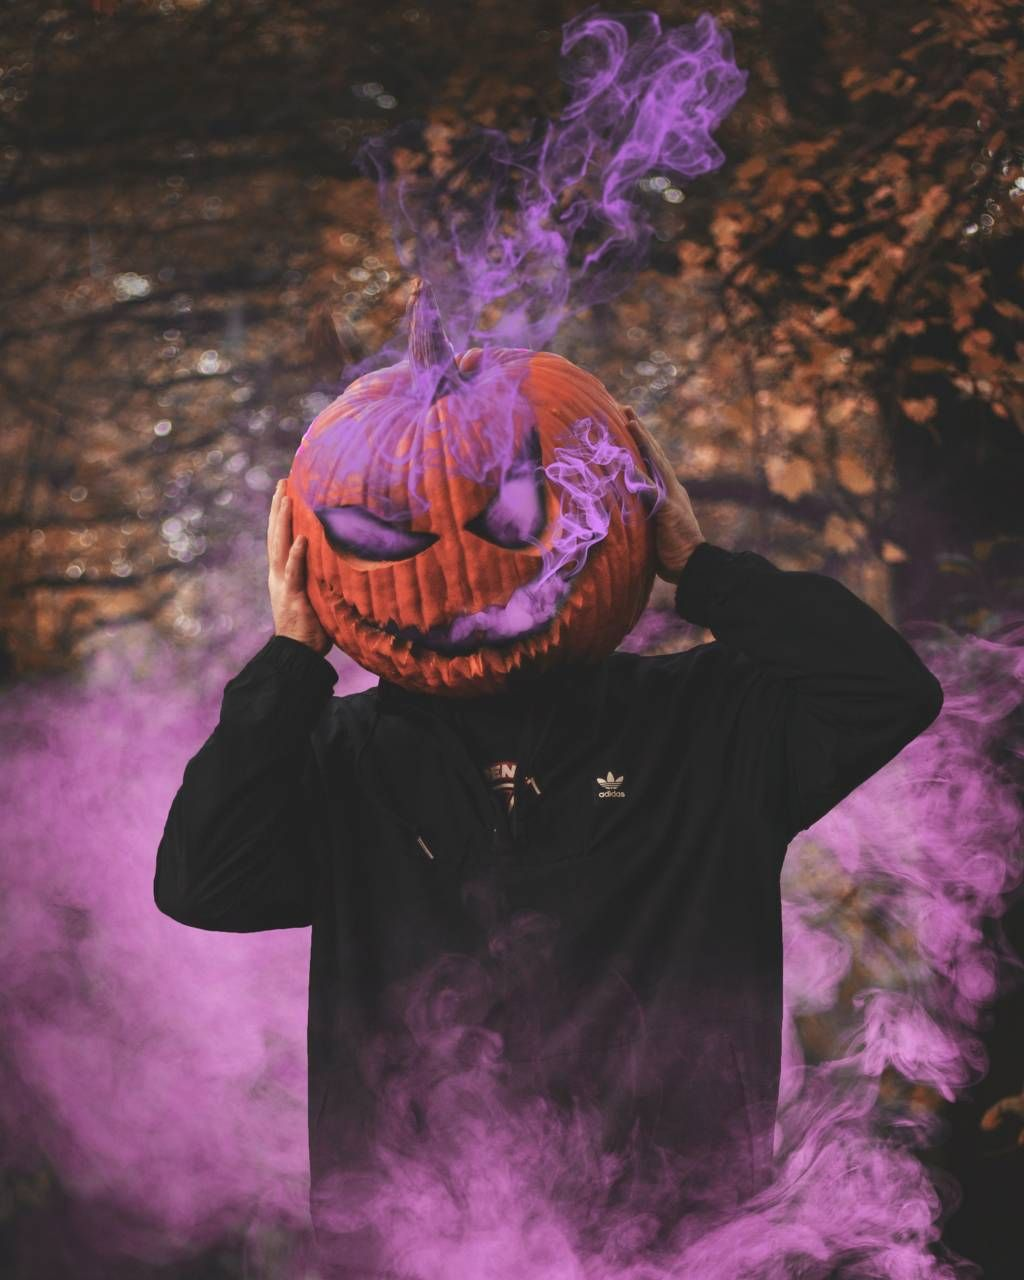 Download Pumpkin Purple Wallpaper By Tayurakk 32 Free On Zedge Now Browse Millions Of Popular P Pumpkin Wallpaper Halloween Wallpaper Pumpkin Photography